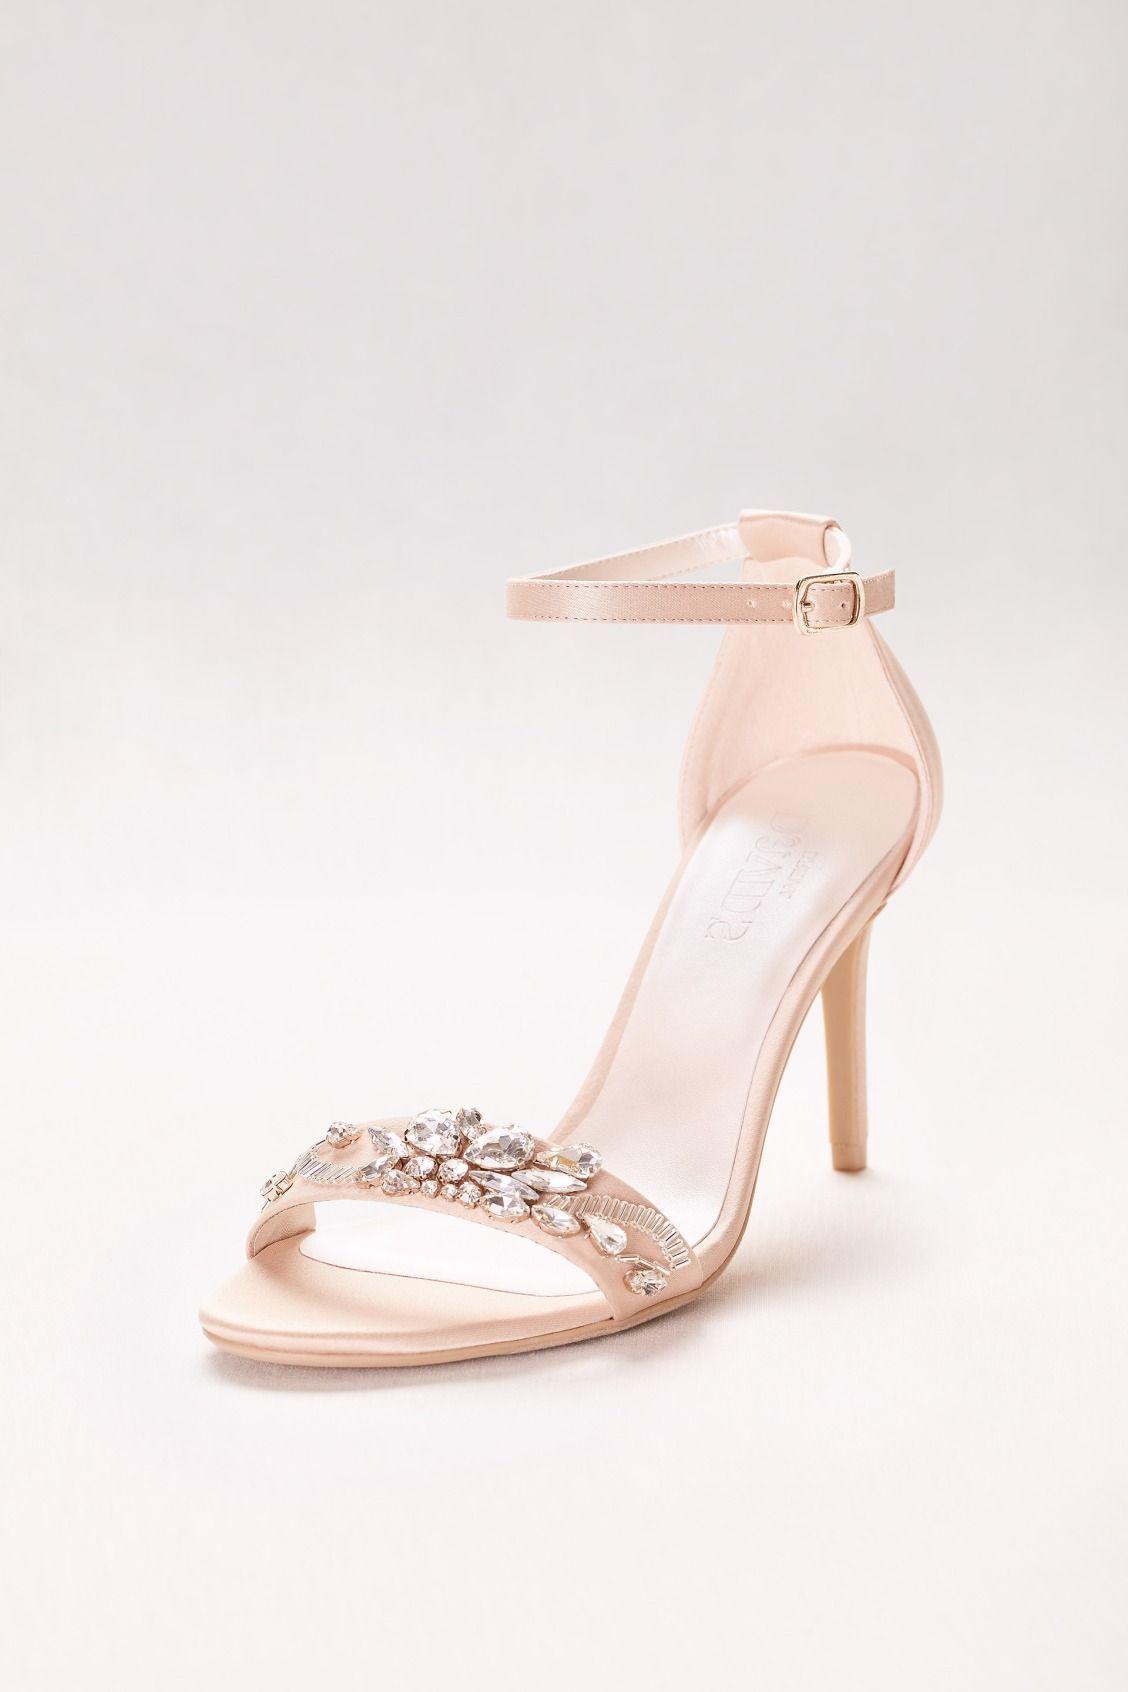 70e0b1e1e521 Jeweled Strappy Nude Prom Heels by David s Bridal